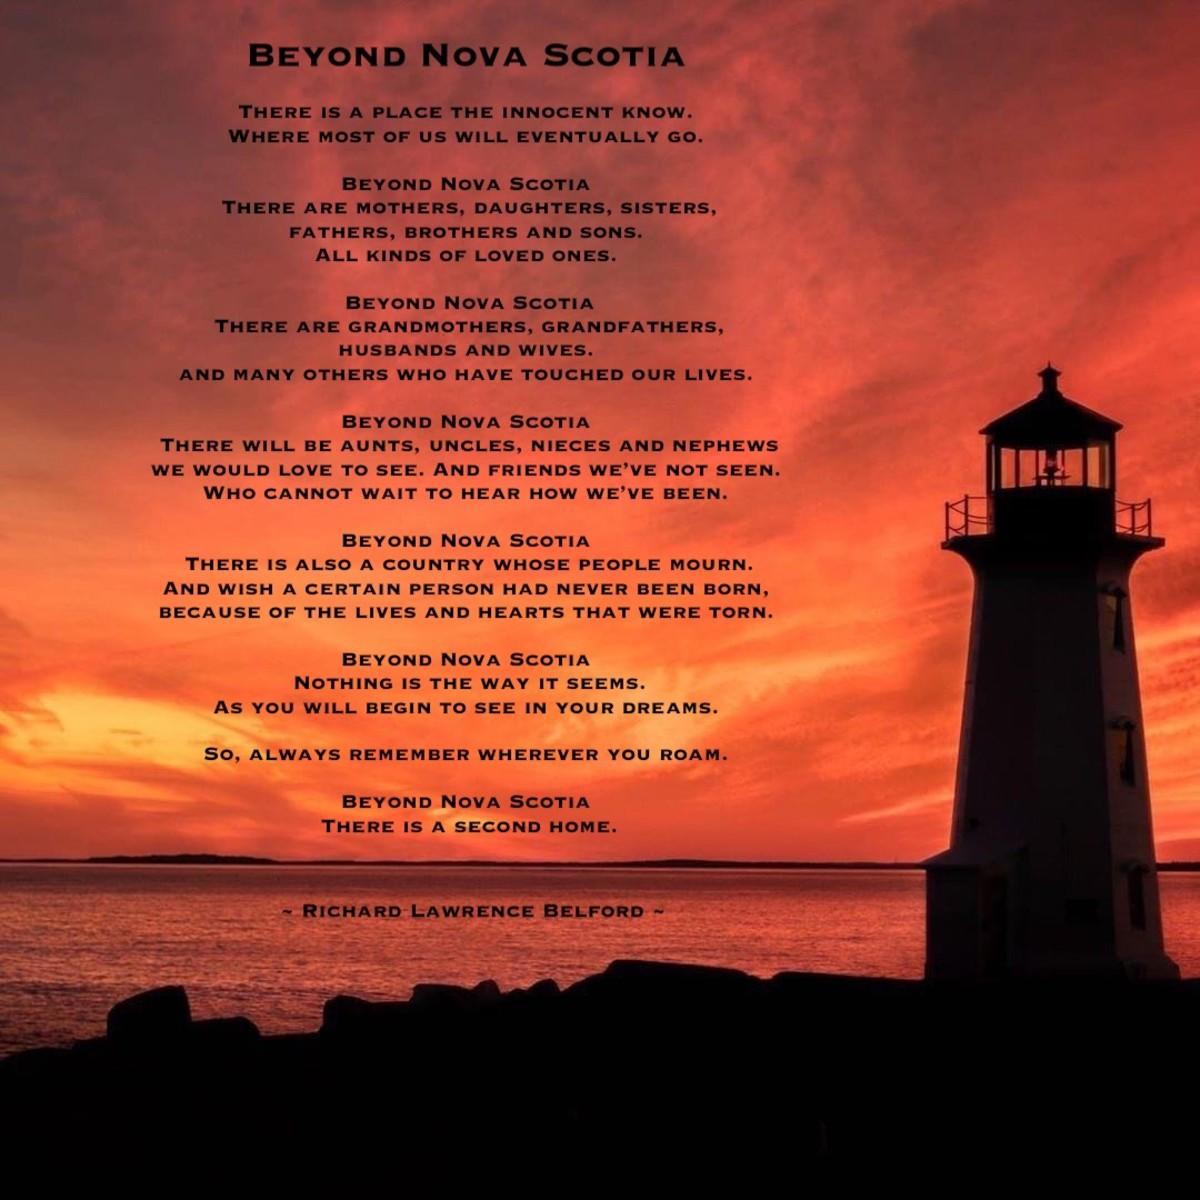 beyond-nova-scotia